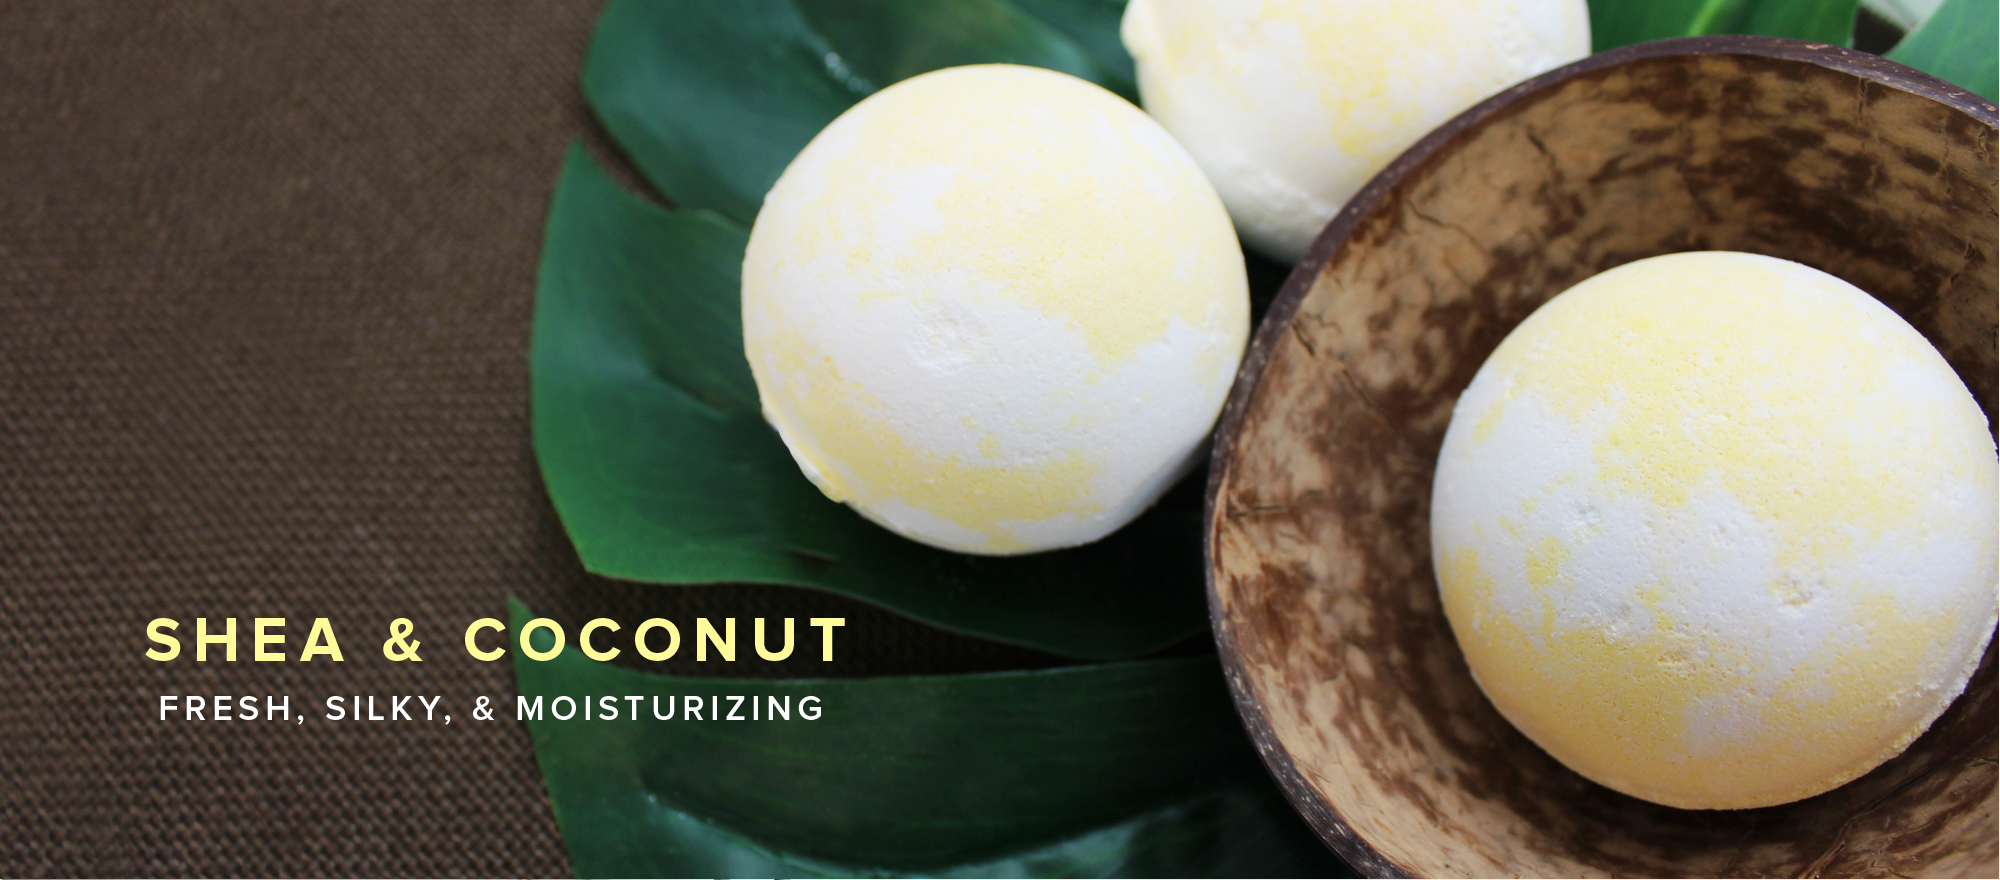 Shea & Coconut Bath Bomb